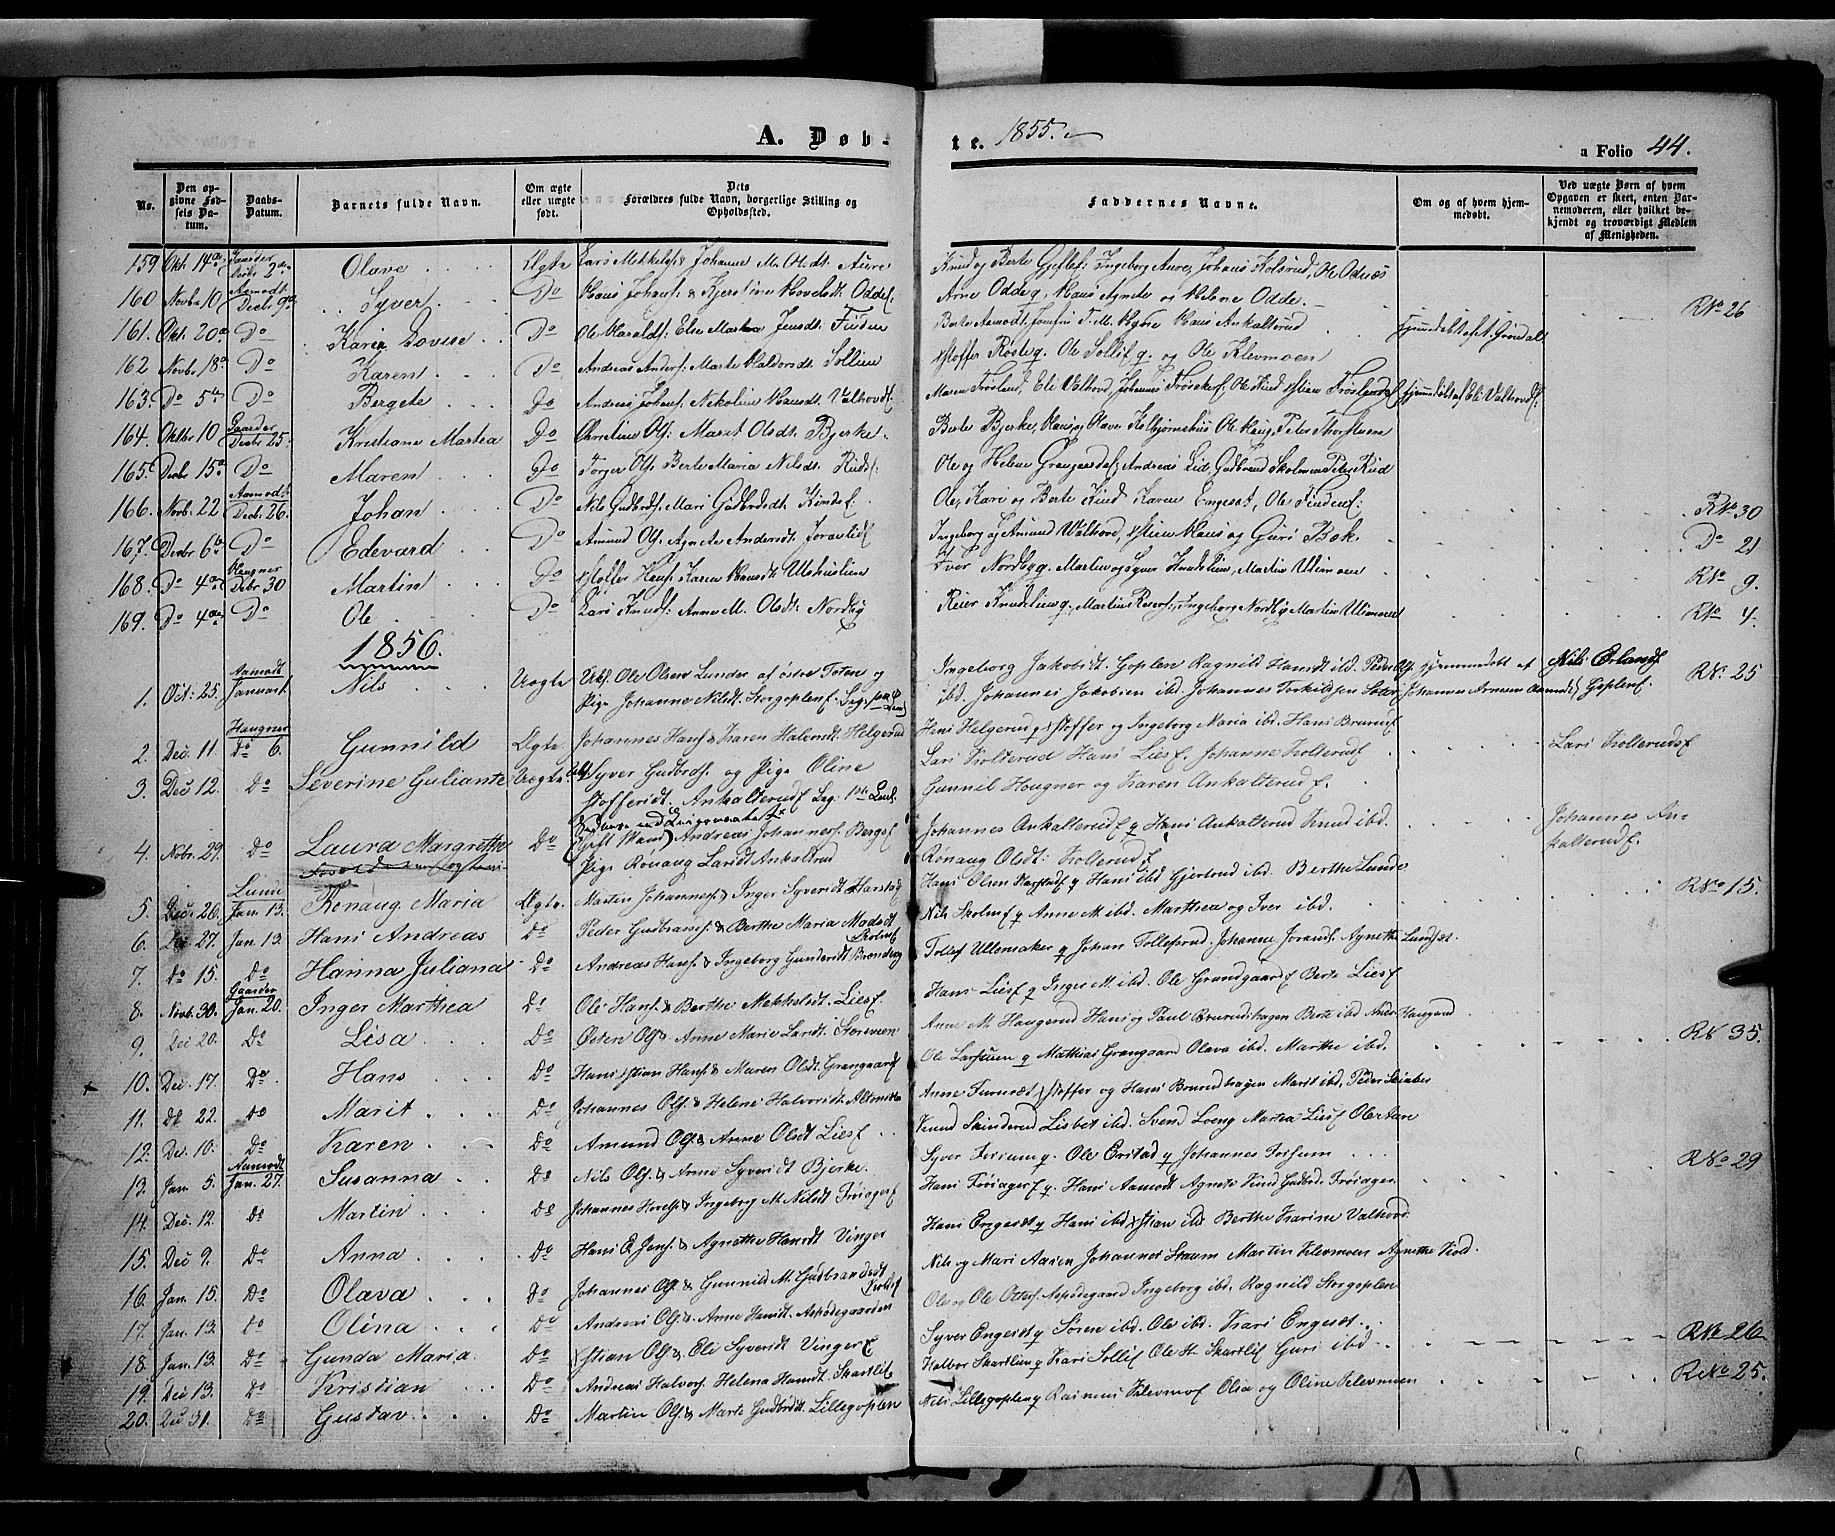 SAH, Land prestekontor, Ministerialbok nr. 10, 1847-1859, s. 44